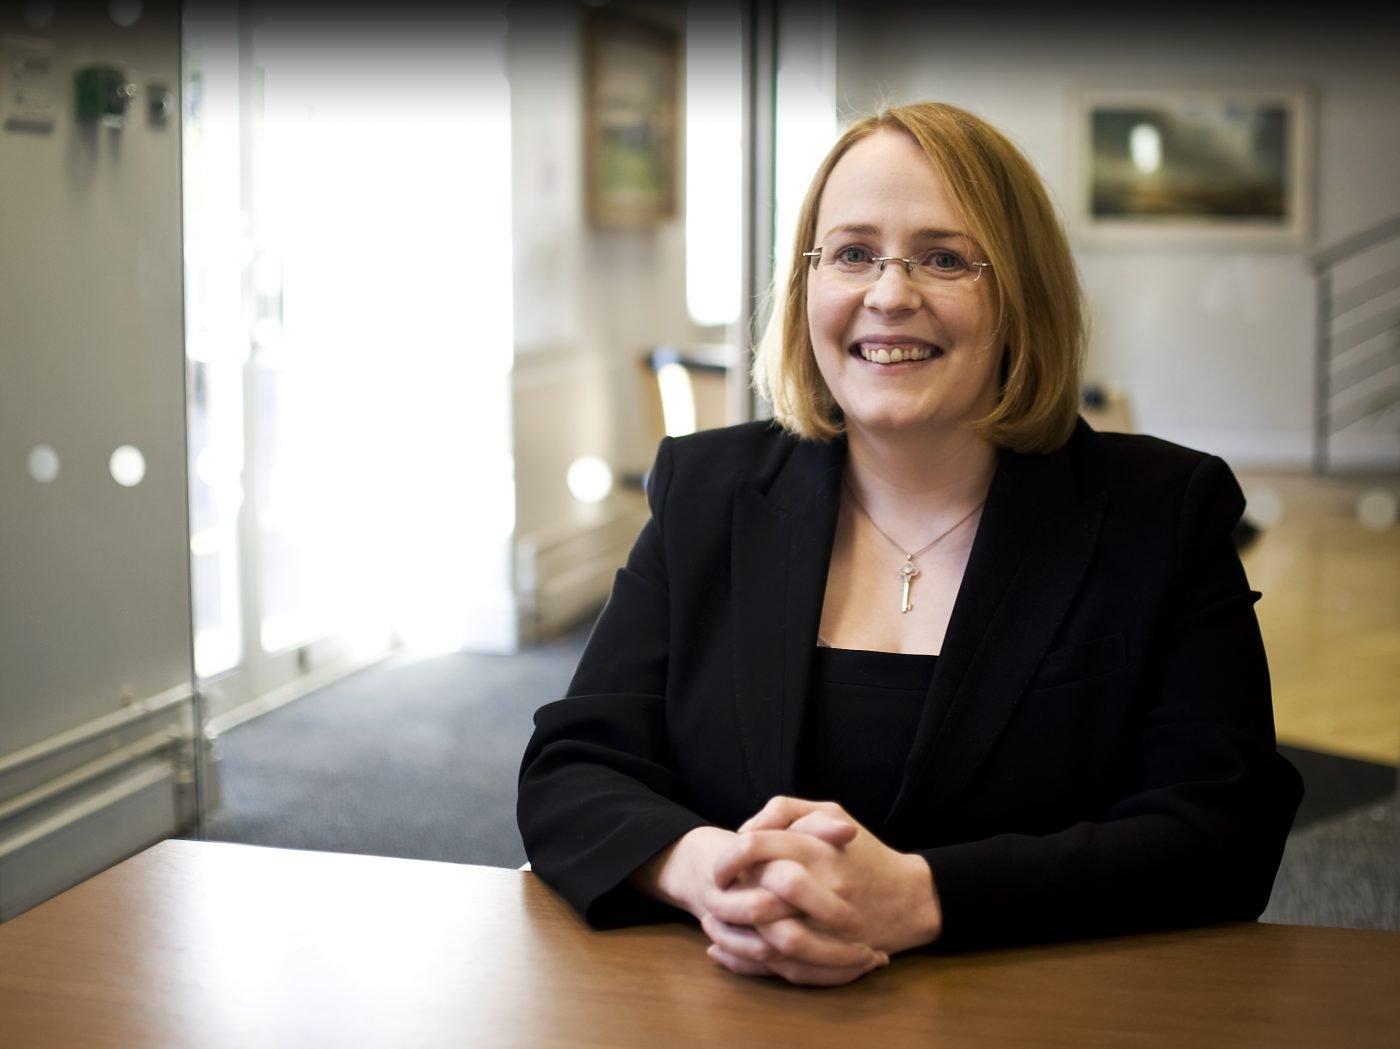 Carol McBride